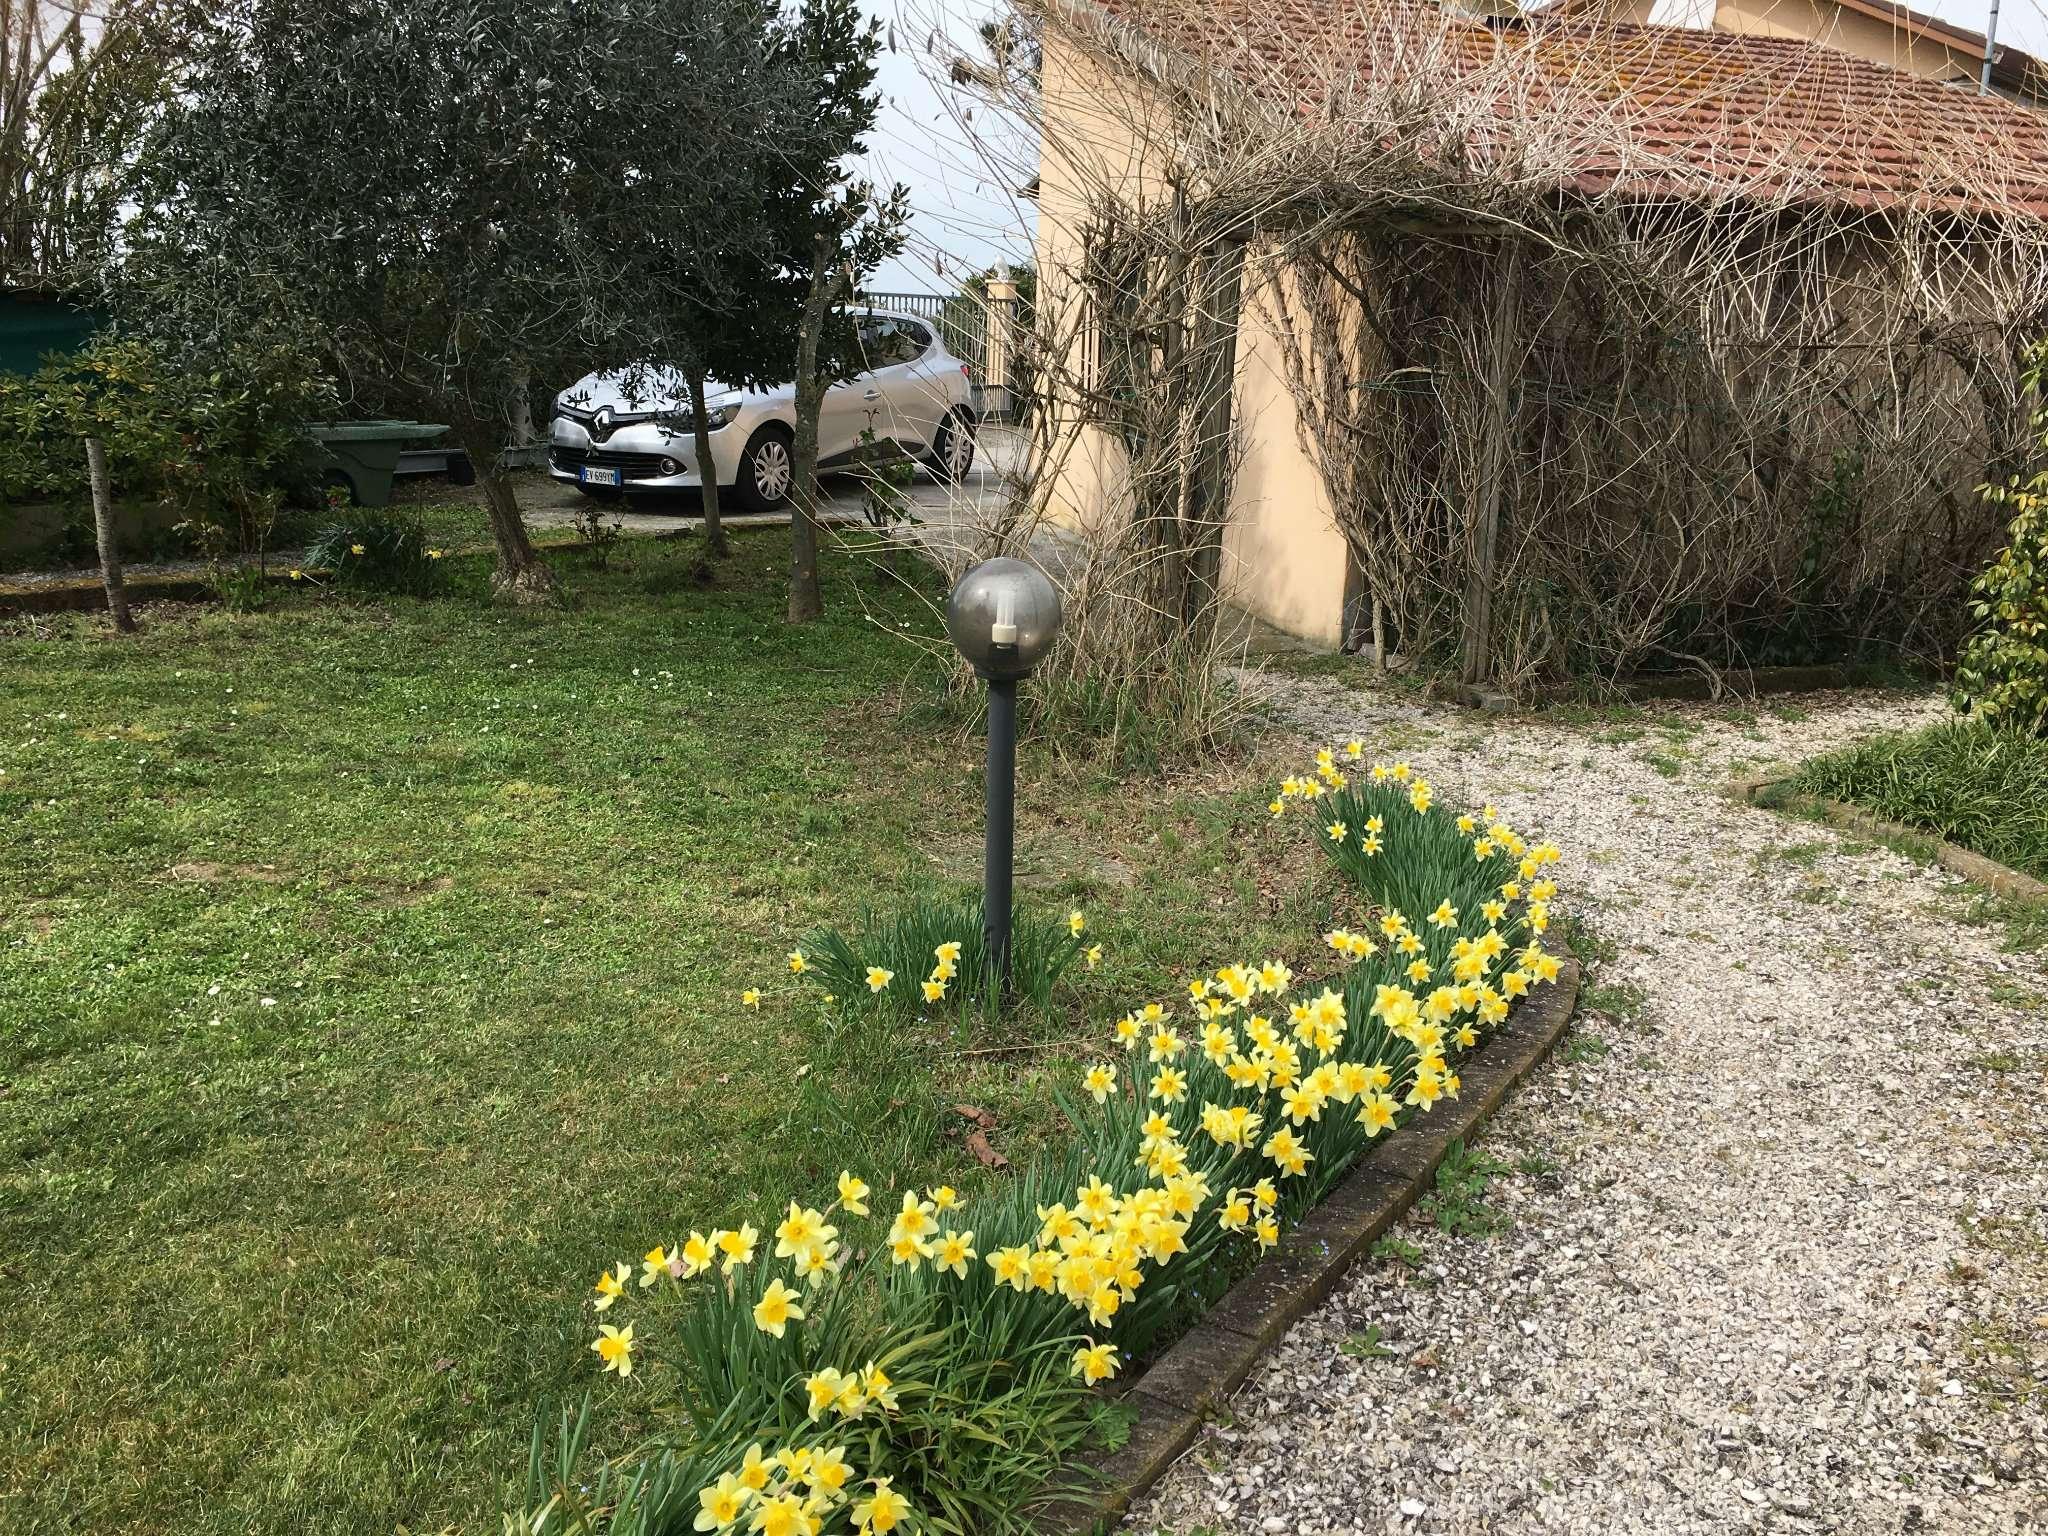 Casa indipendente in Vendita a Ravenna Periferia Sud: 5 locali, 115 mq